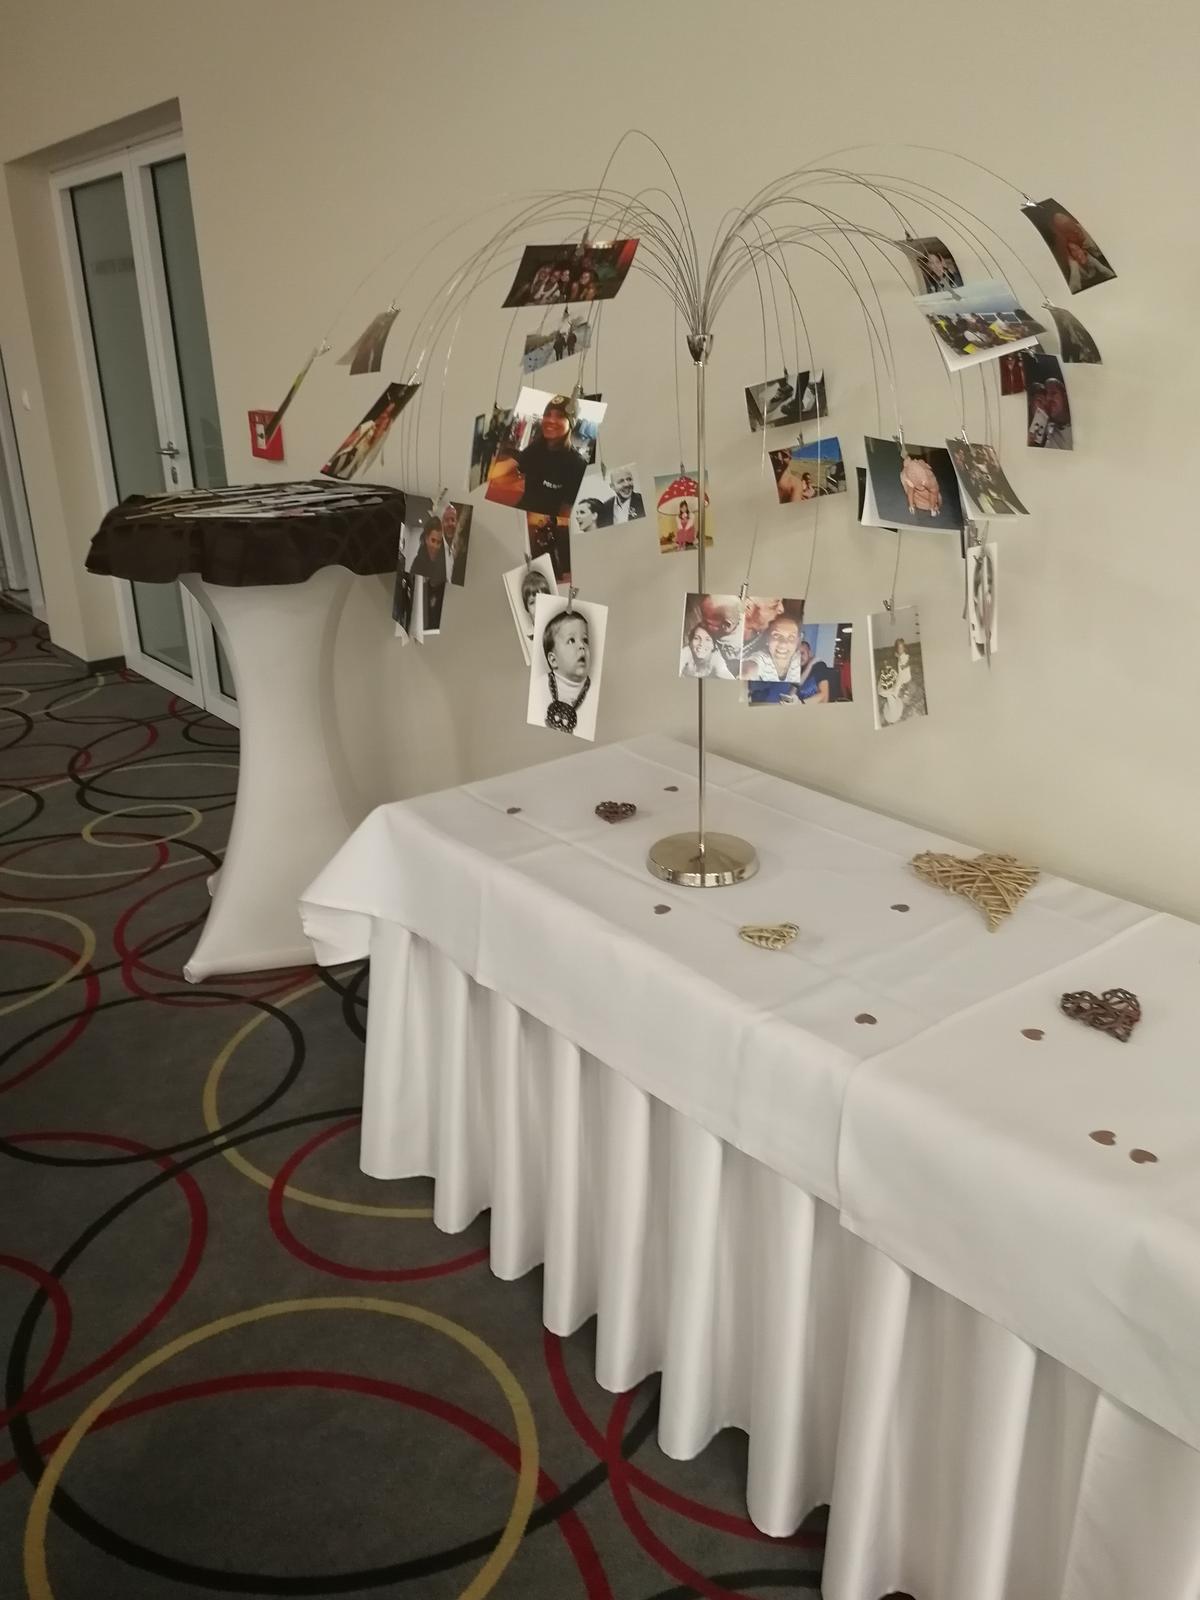 Svadba 7.4.2018 Zvolen Hotel TENIS - Obrázok č. 5